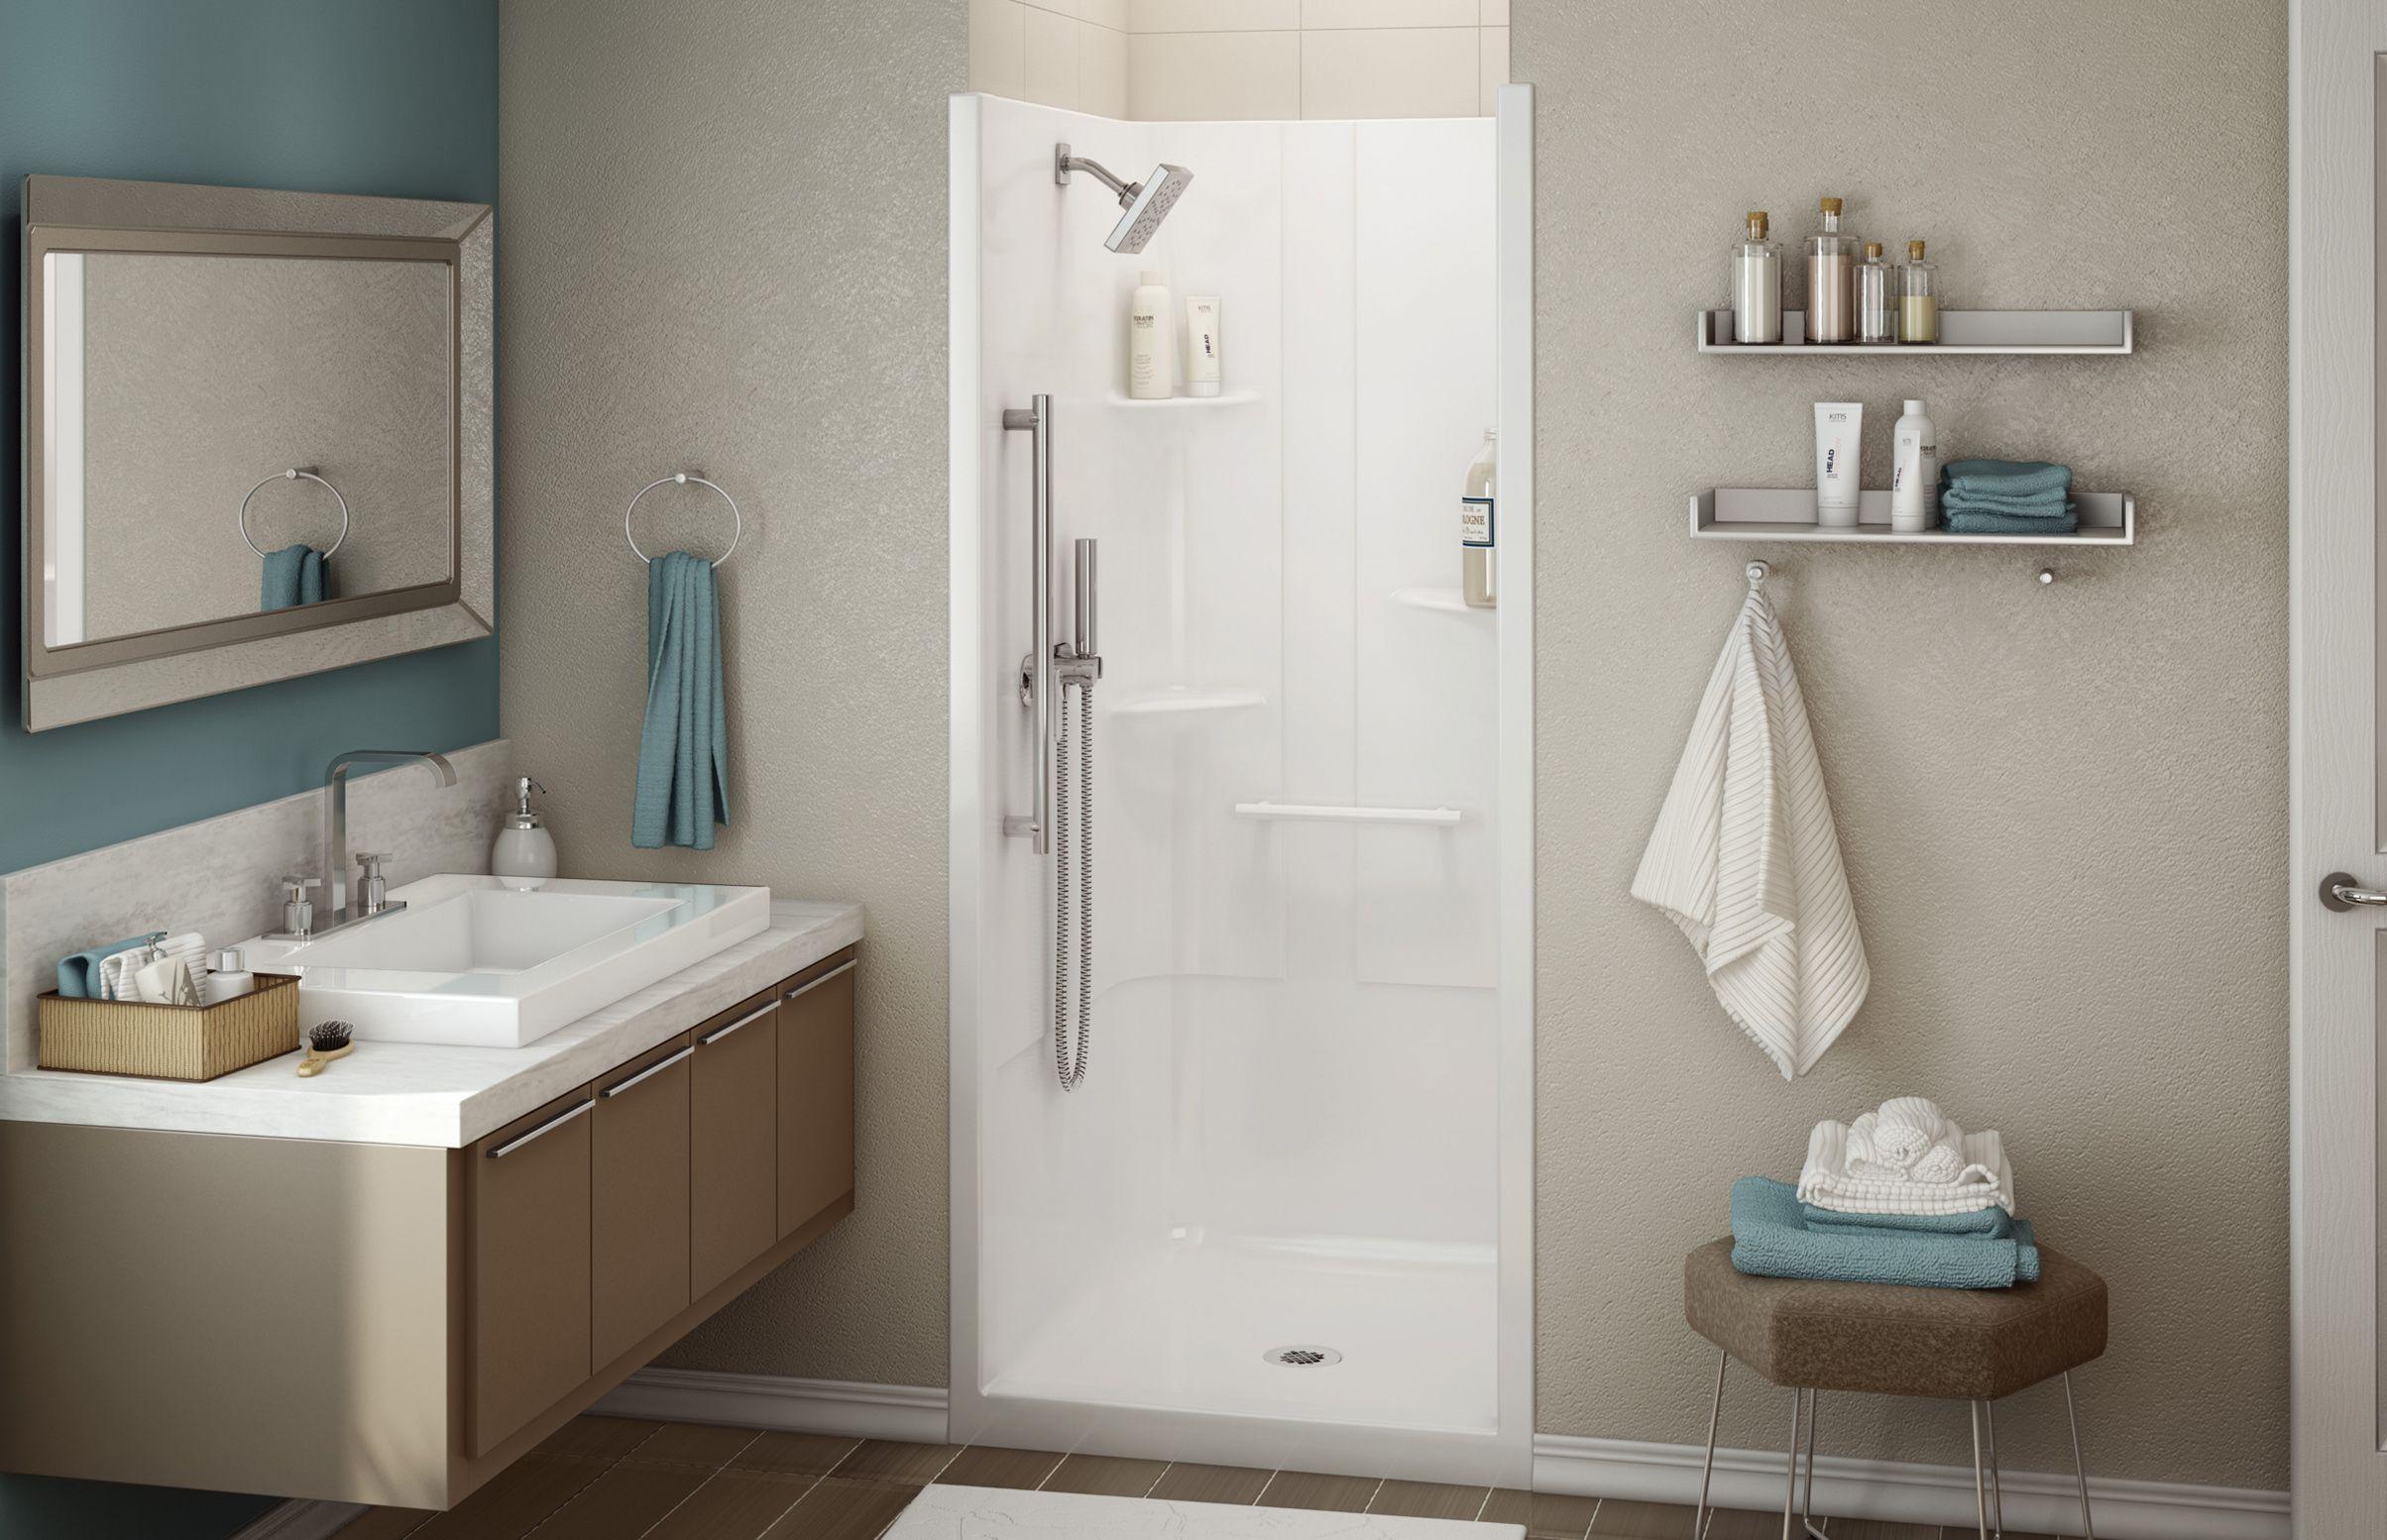 ALLIA SH-3636 Alcove Showers - MAAX Professional?   MAAX   Pinterest ...